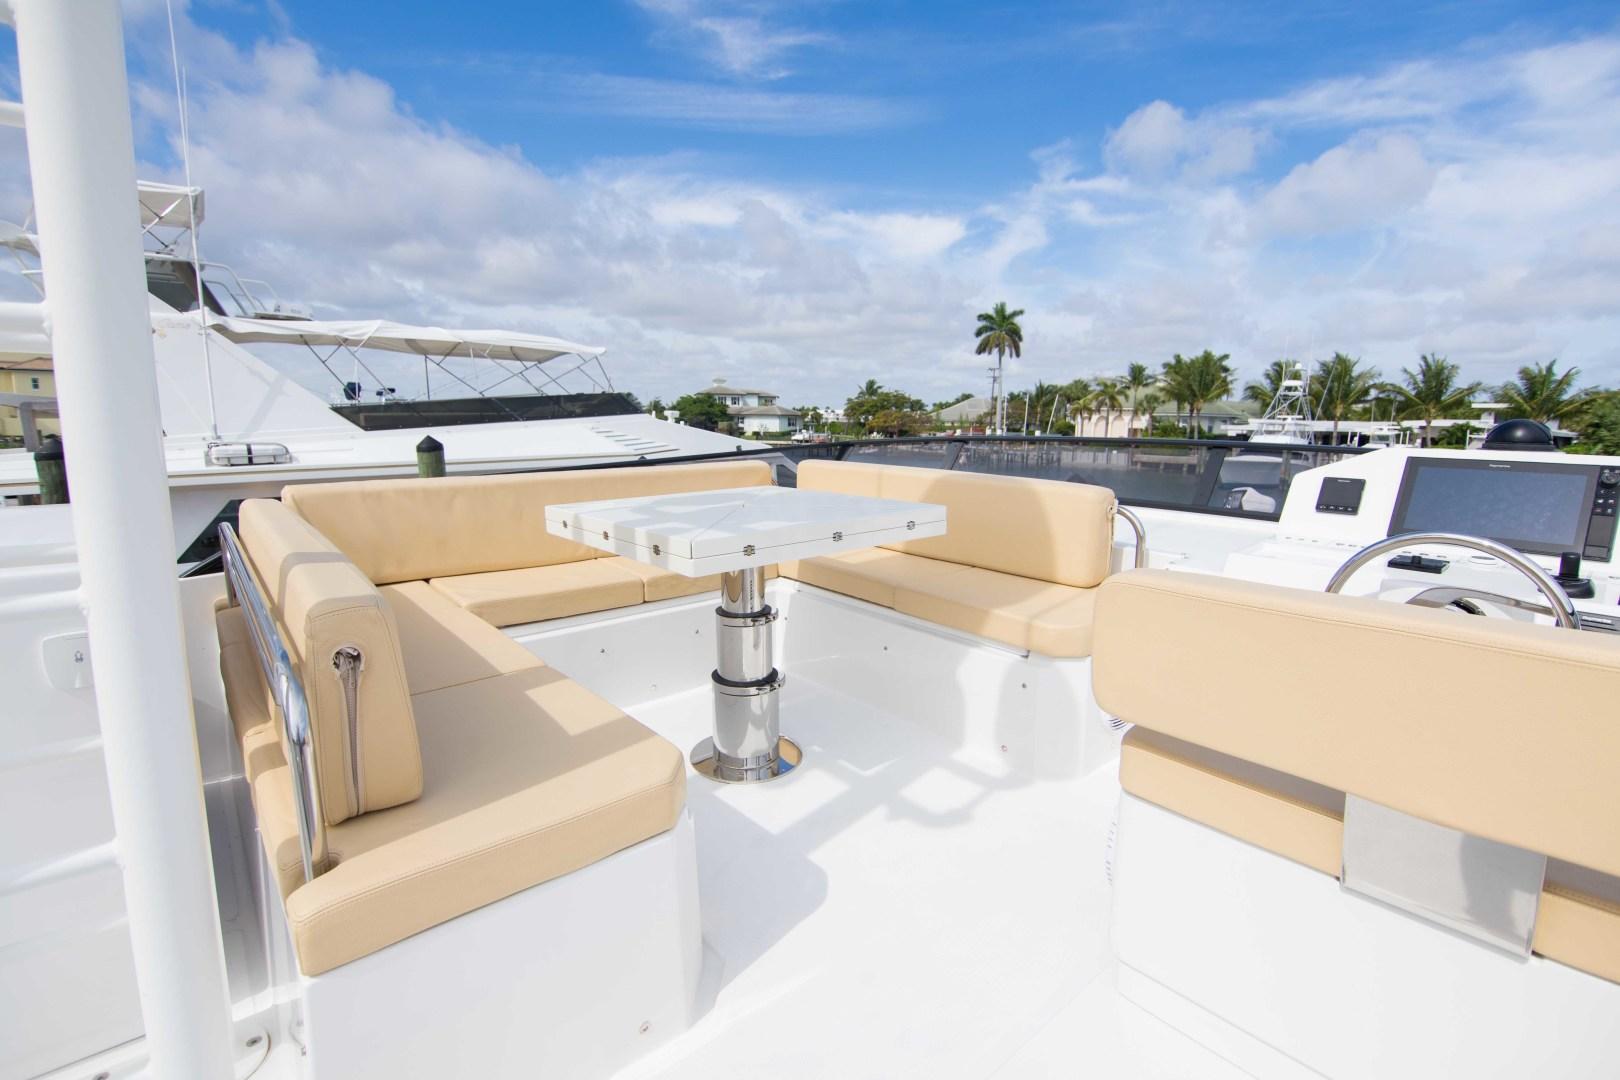 Sundeck-58 Sport 2019-LJ IV Singer Island-Florida-United States-Flybridge-1373079 | Thumbnail